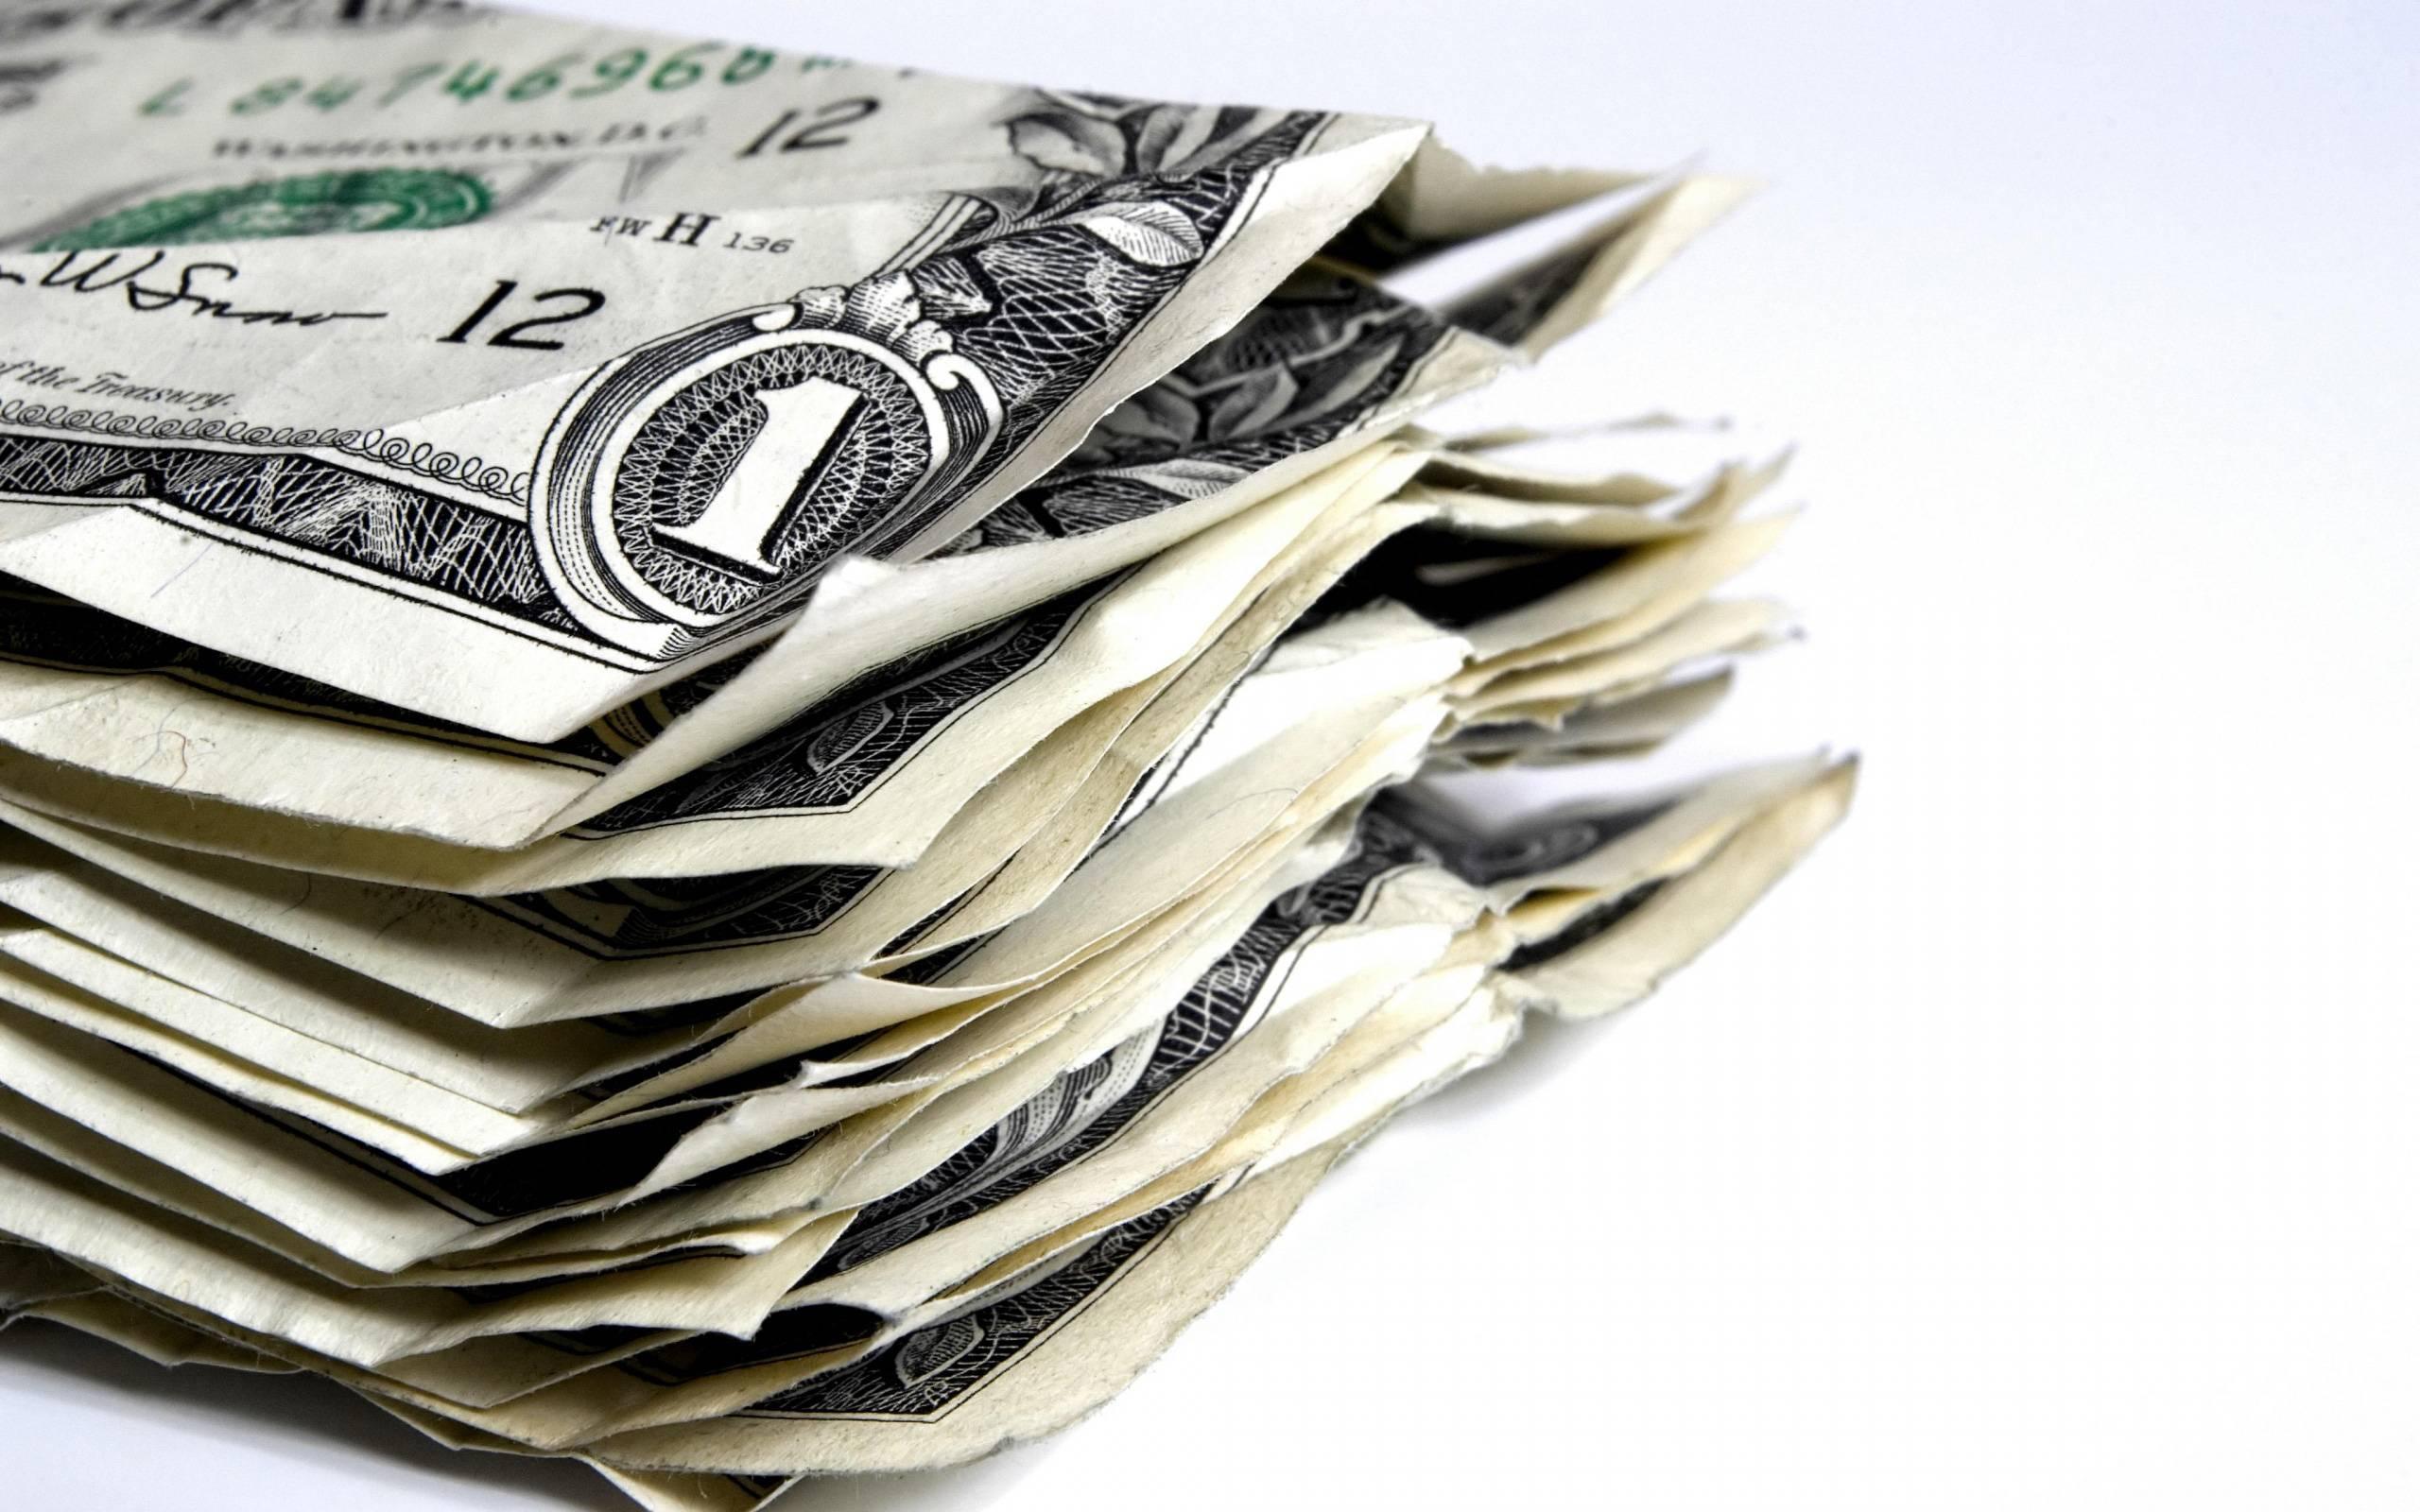 money-81a50cf985f81784d83e1e25f4be096c.jpg